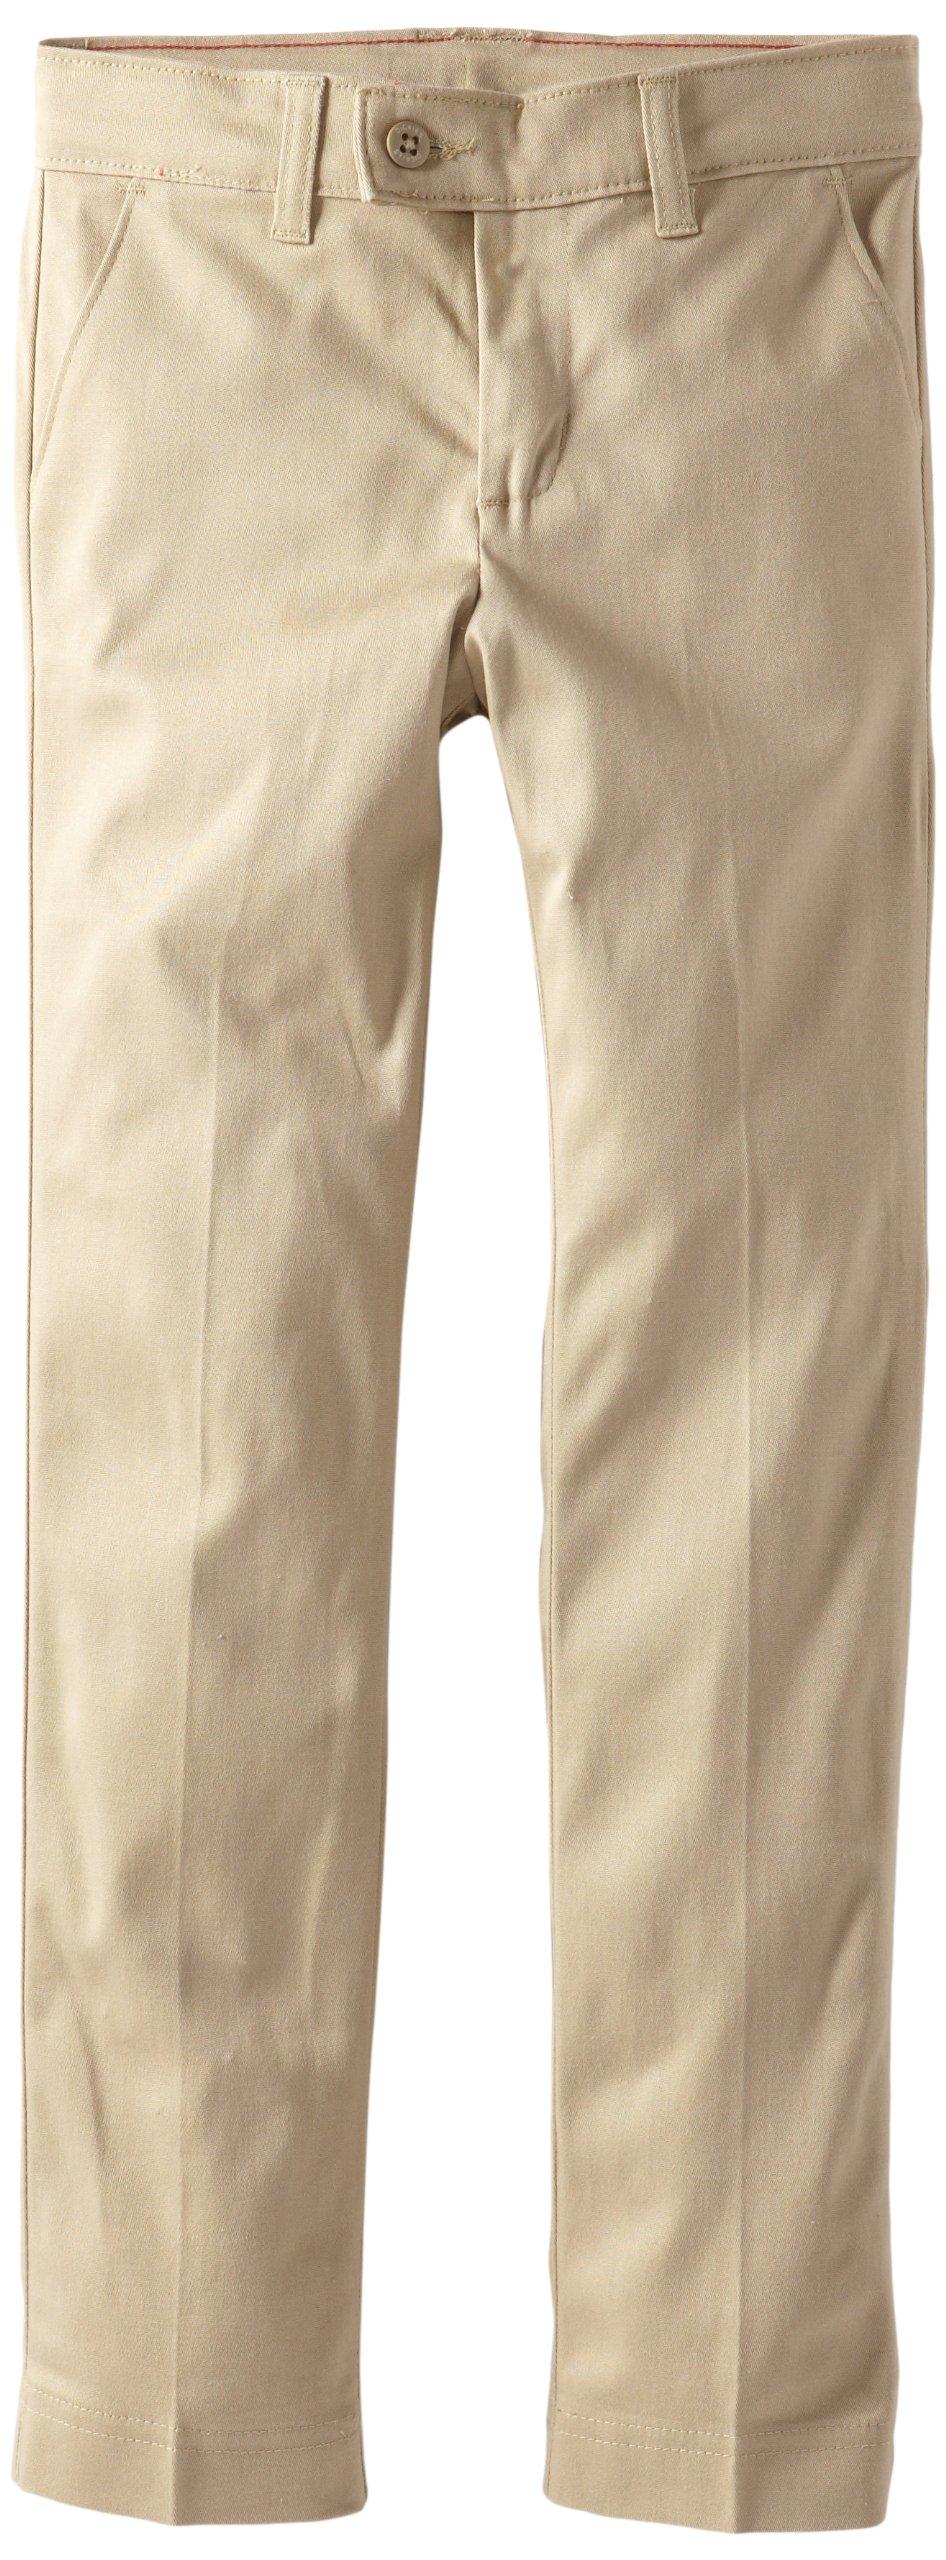 Dickies Big Girls' Stretch Slim Straight Pant, Desert Sand, 18